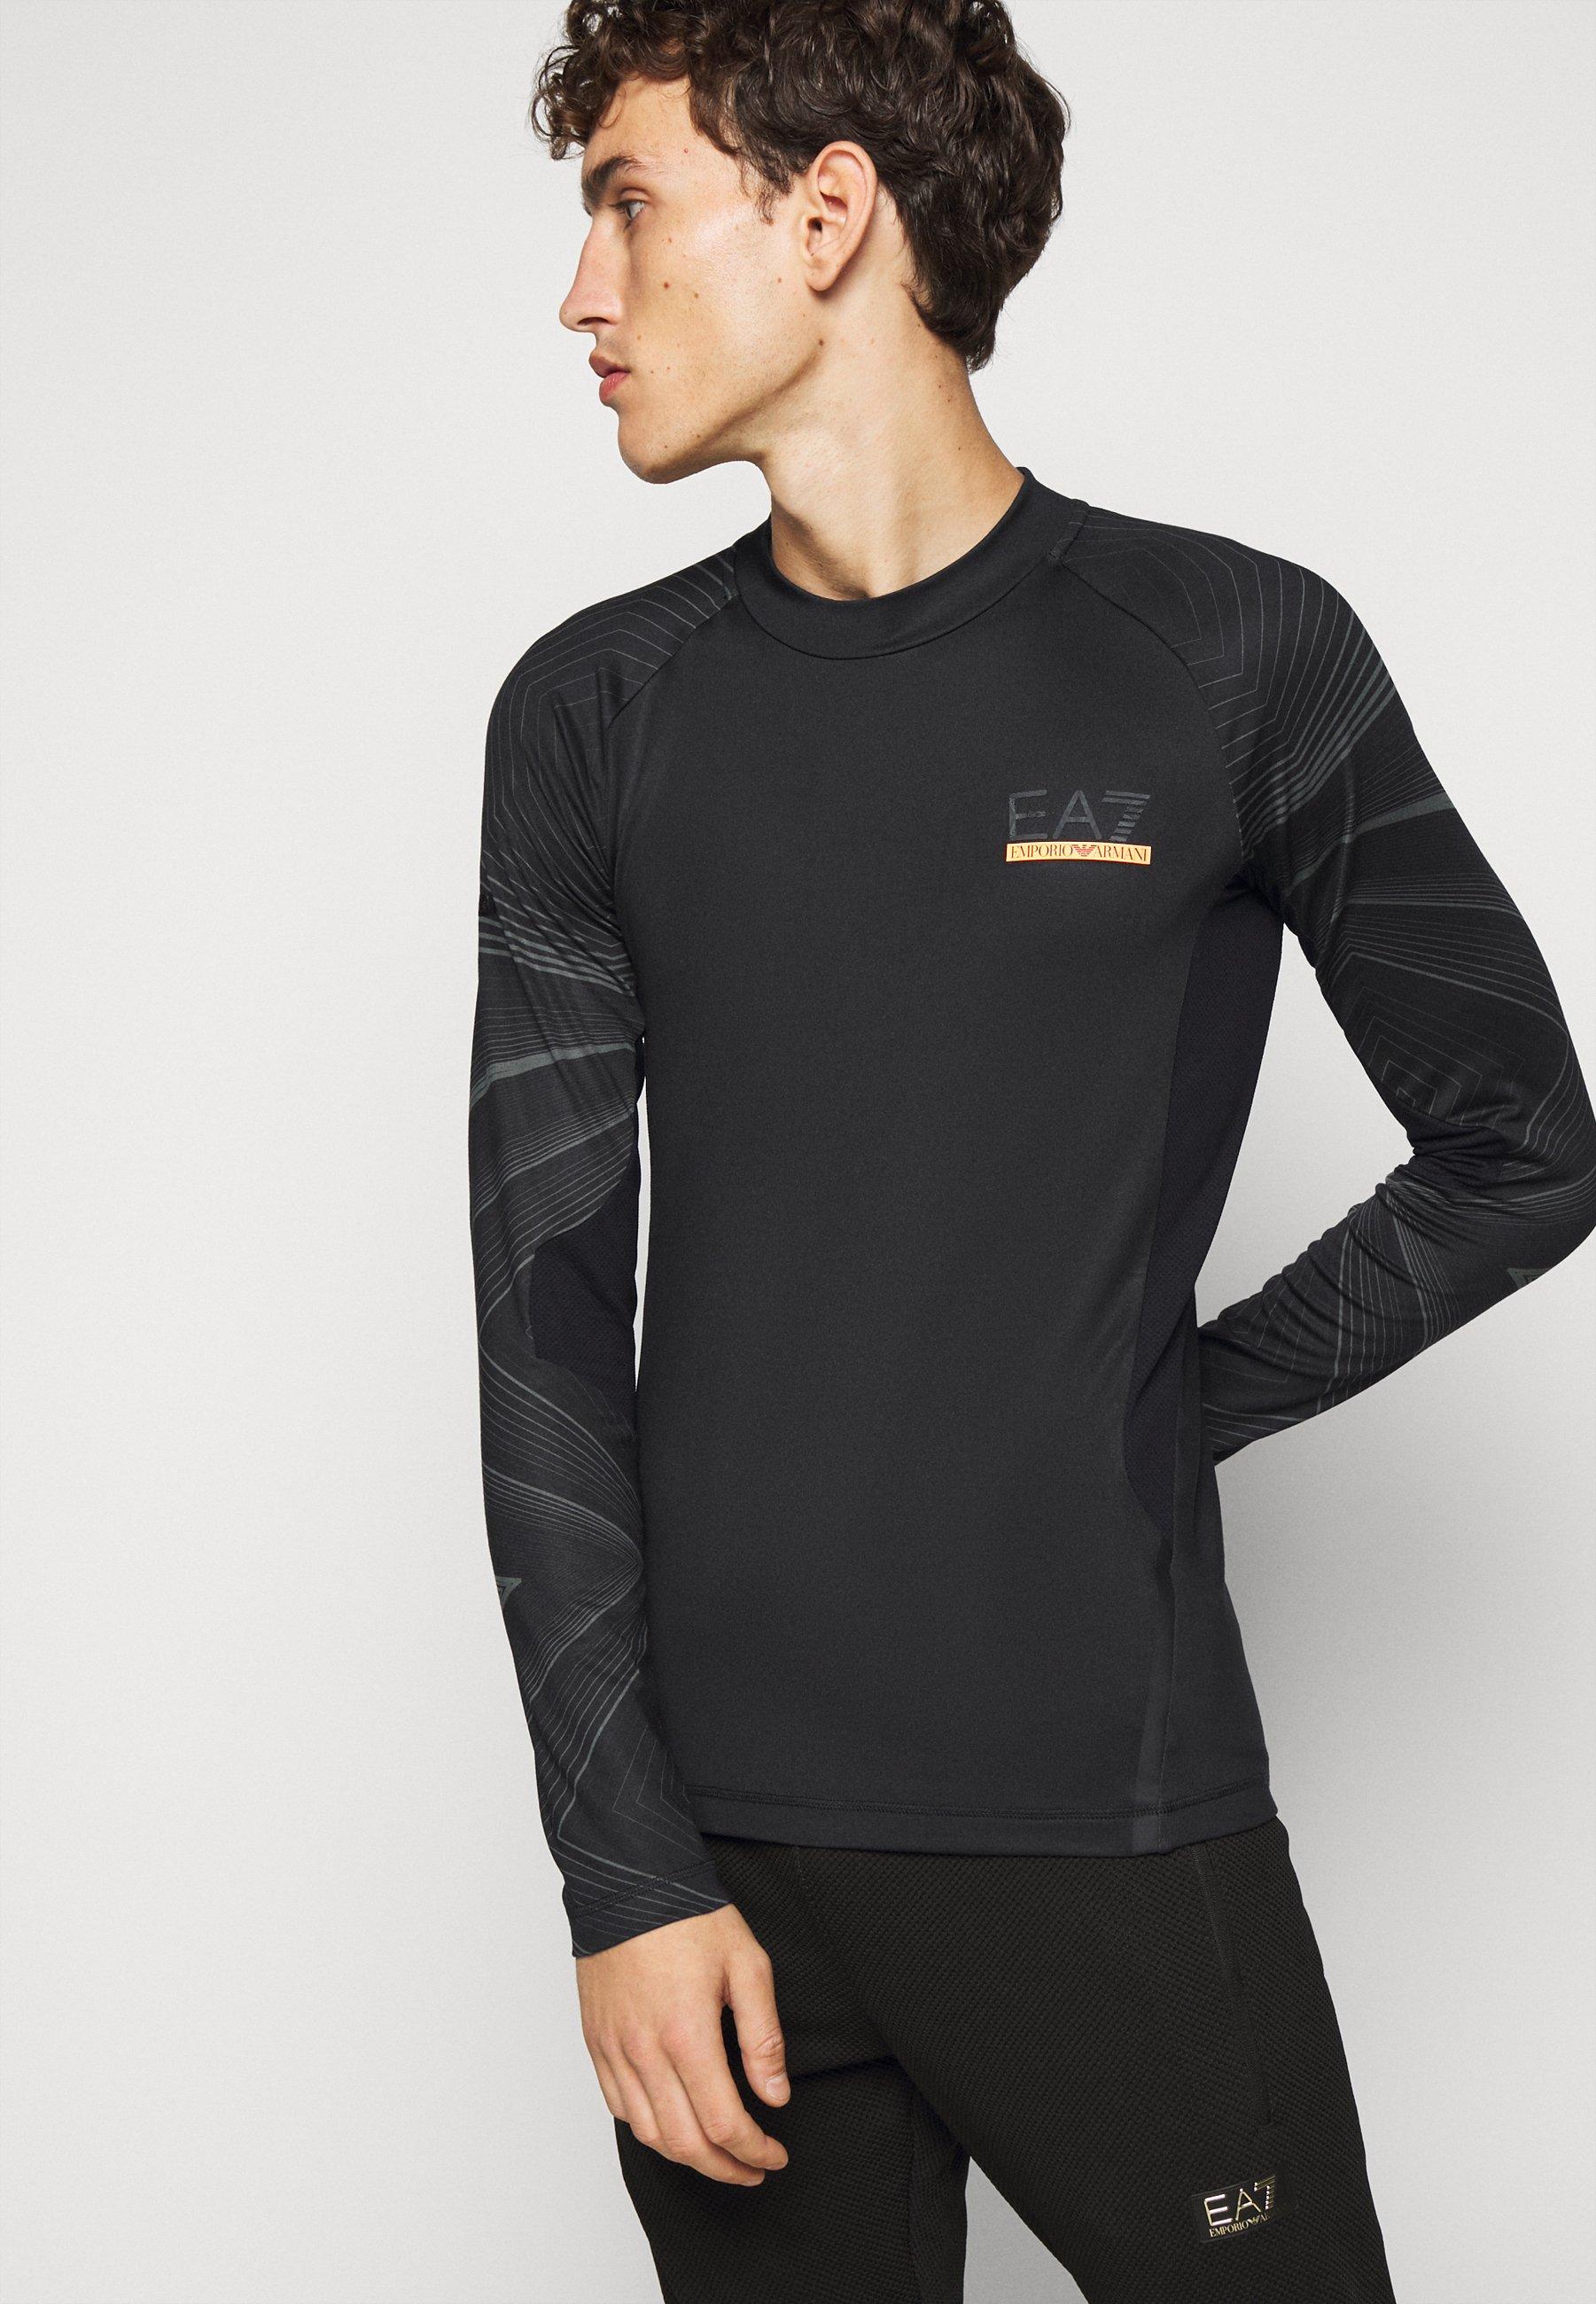 EA7 Emporio Armani PANTALONI - Print T-shirt - black PVuUG